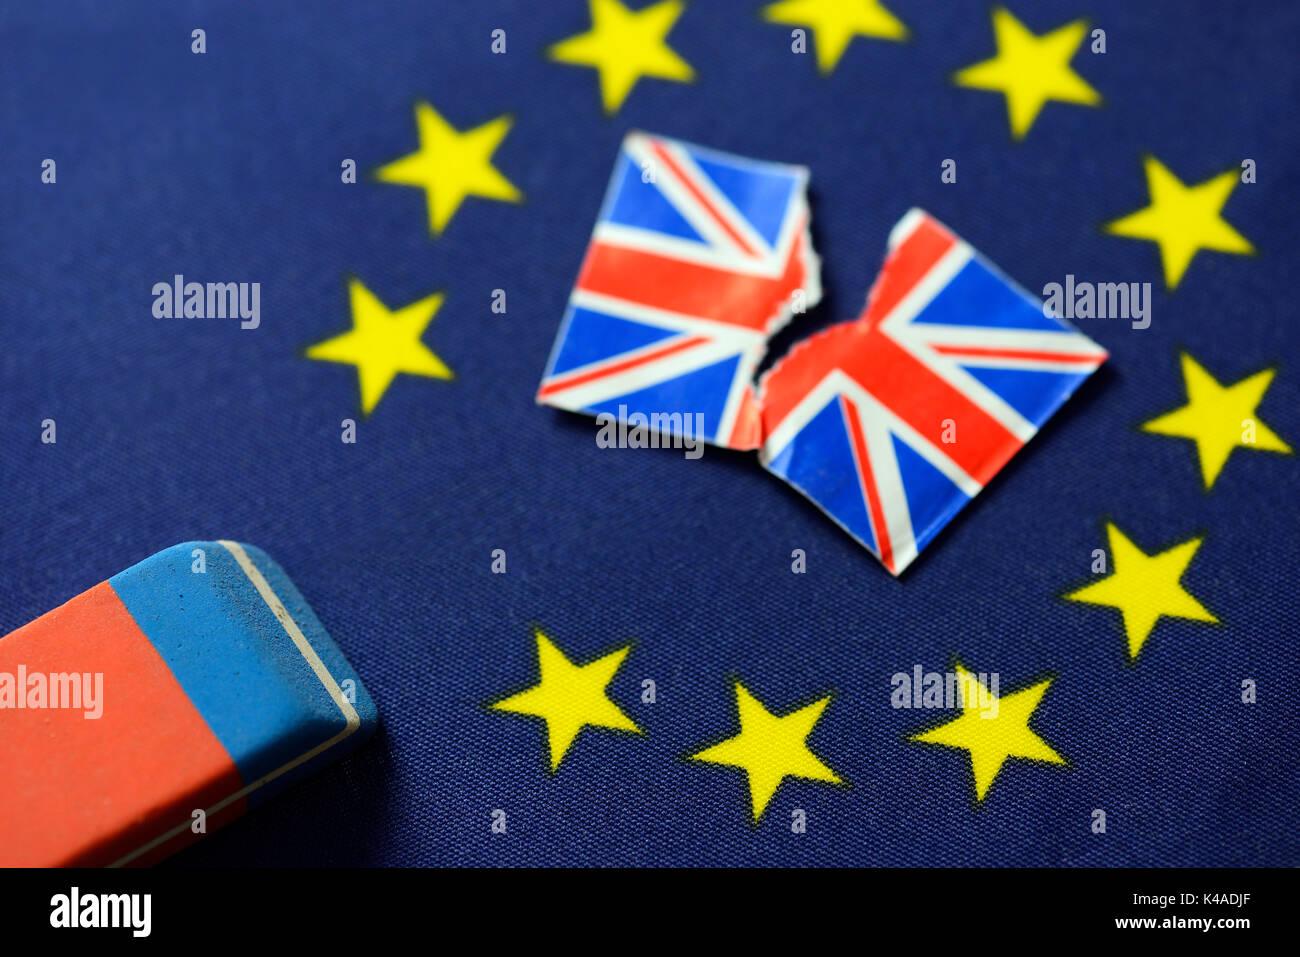 Eu Flag Star Brexit Stock Photos & Eu Flag Star Brexit Stock